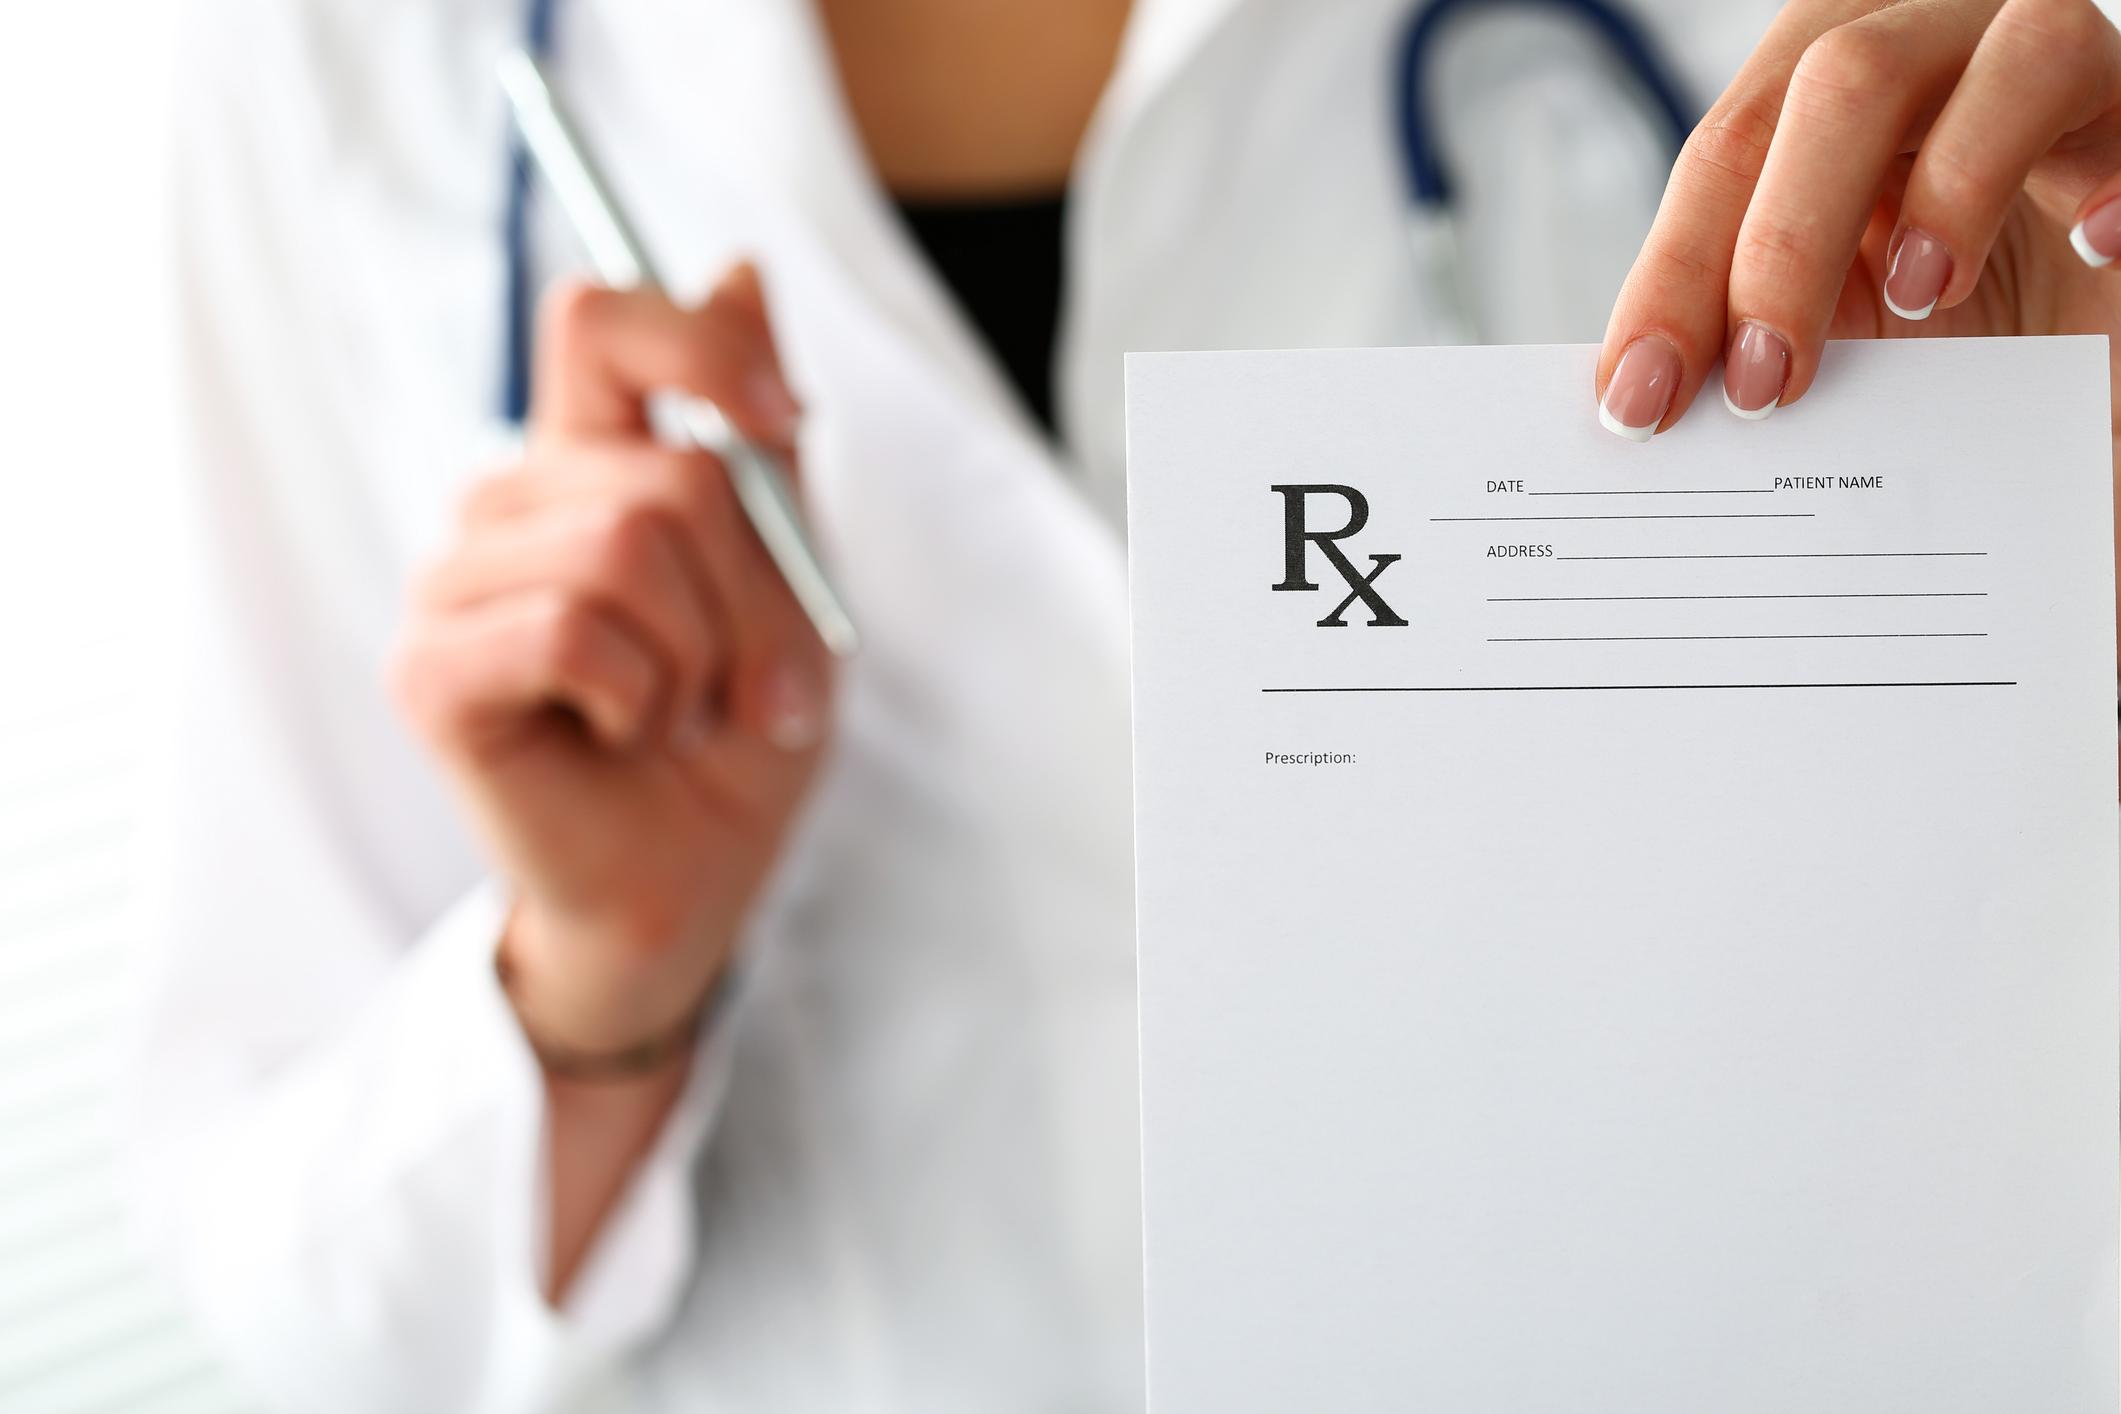 A doctor holding a prescription pad.